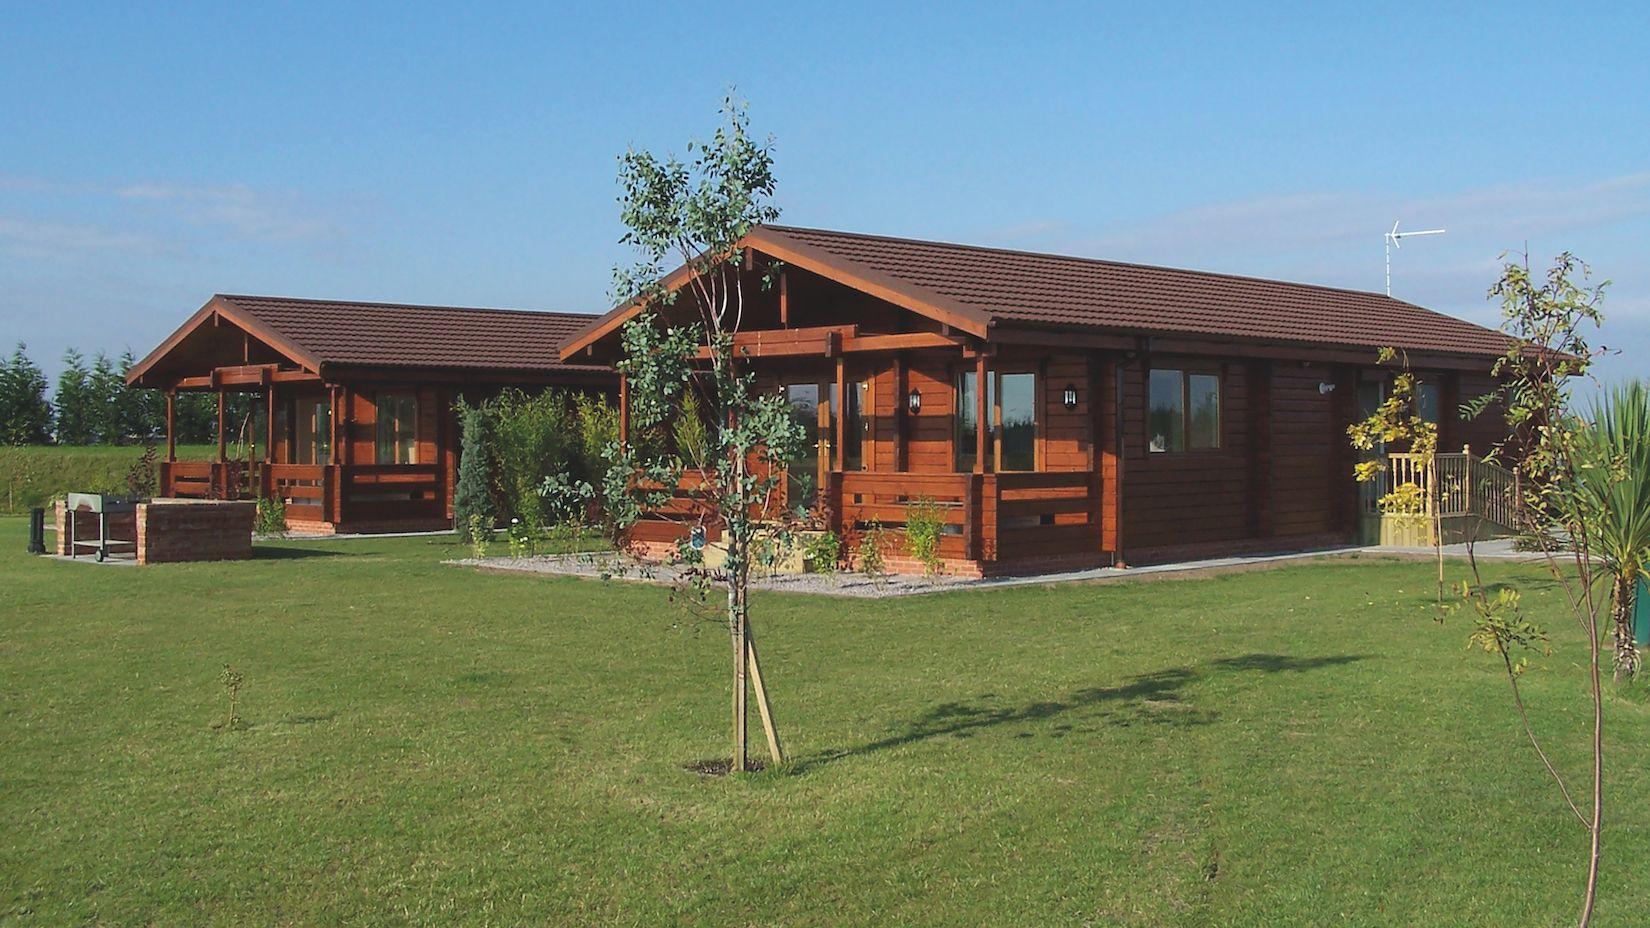 The Westwood – 2 Bedroom Log Home